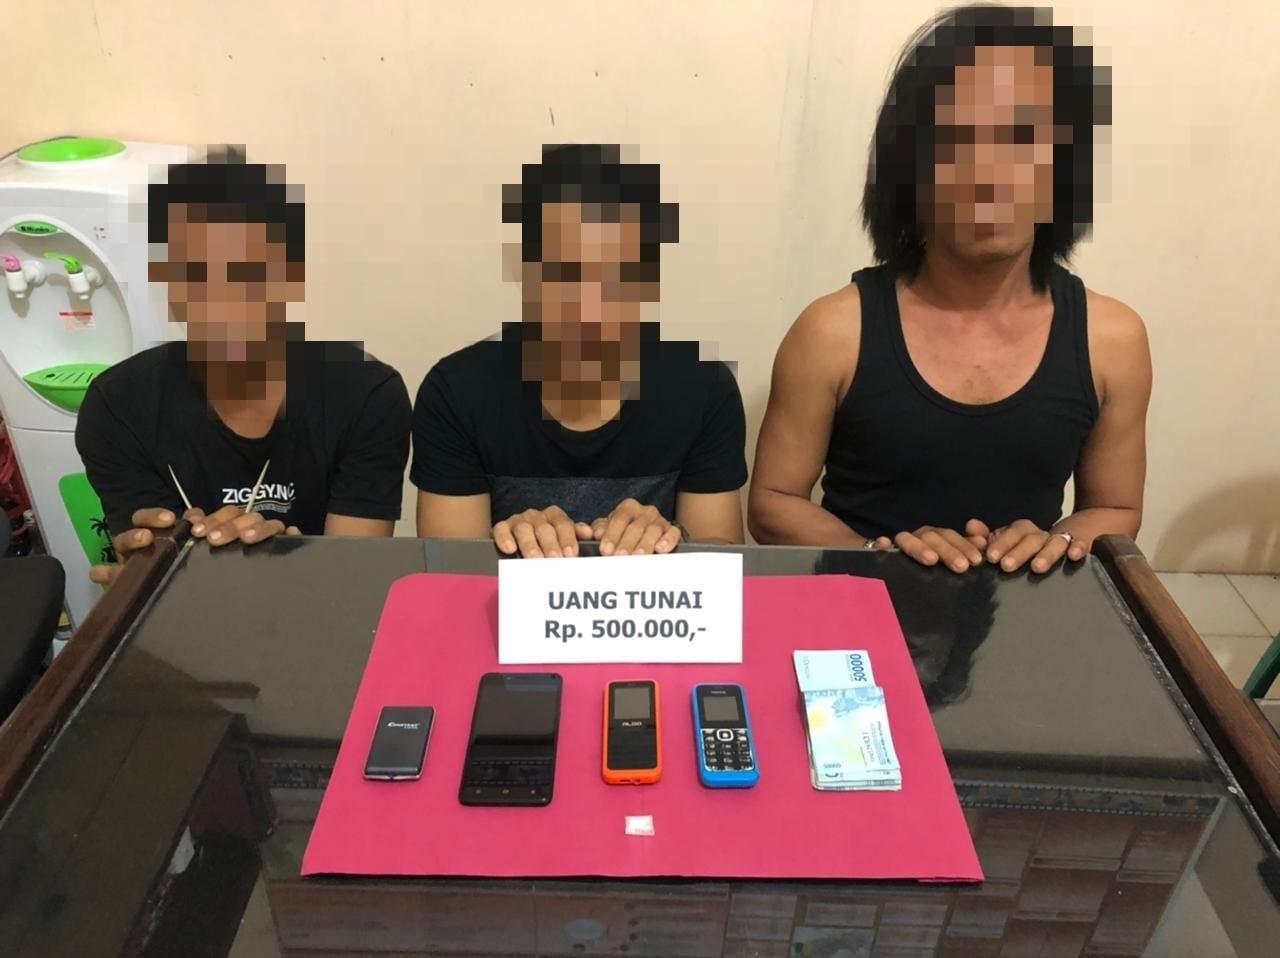 Tiga Pria Pengedar Shabu Berhasil Ditangkap